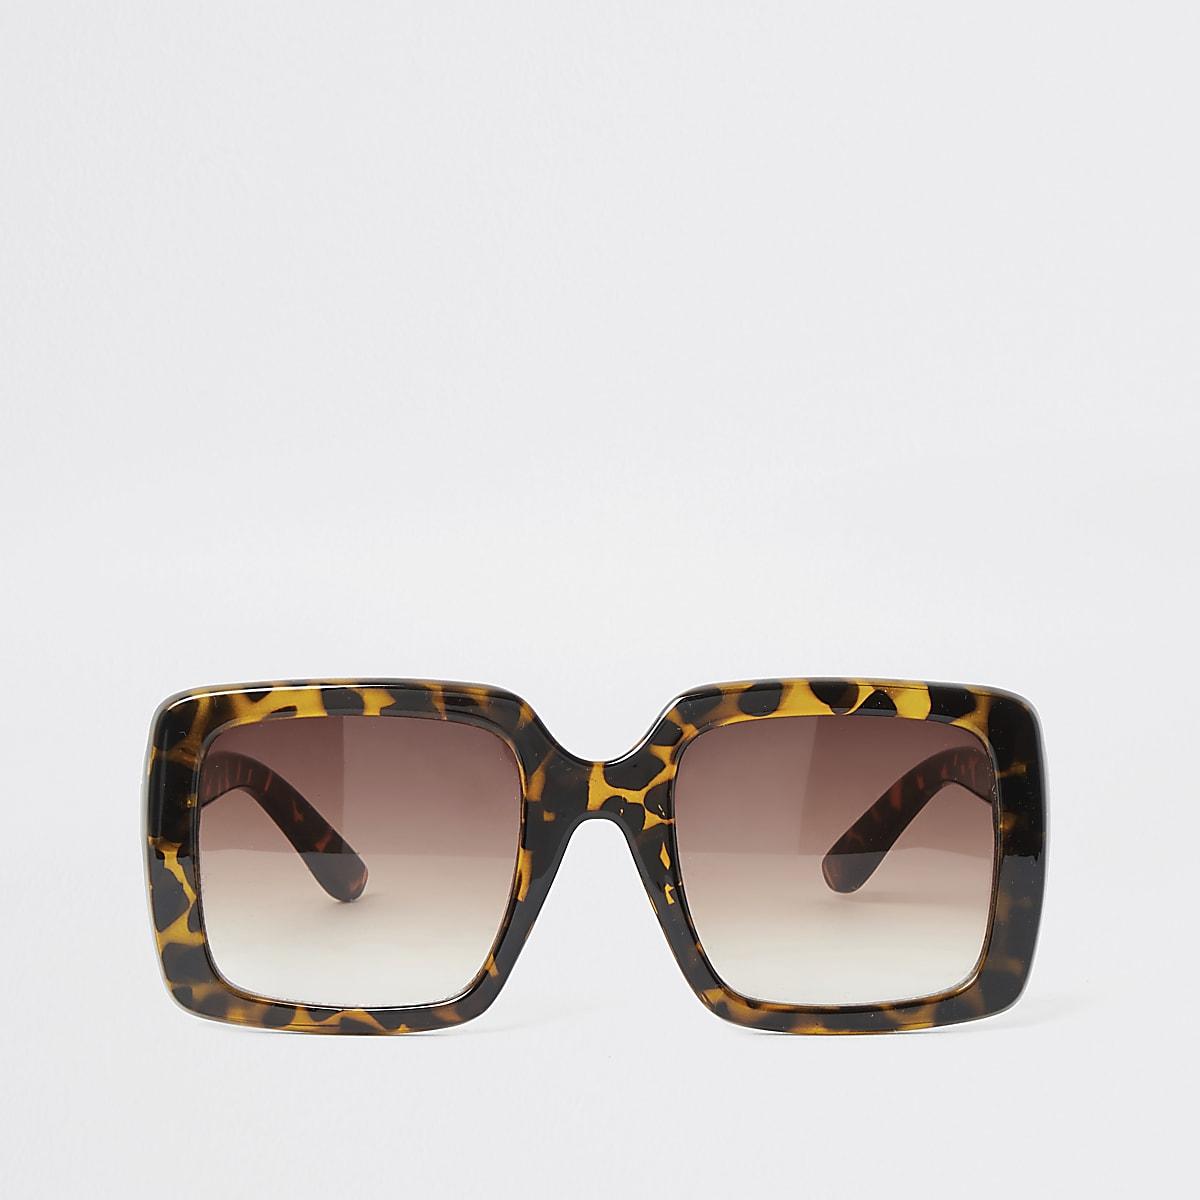 Brown tortoise shell glam sunglasses